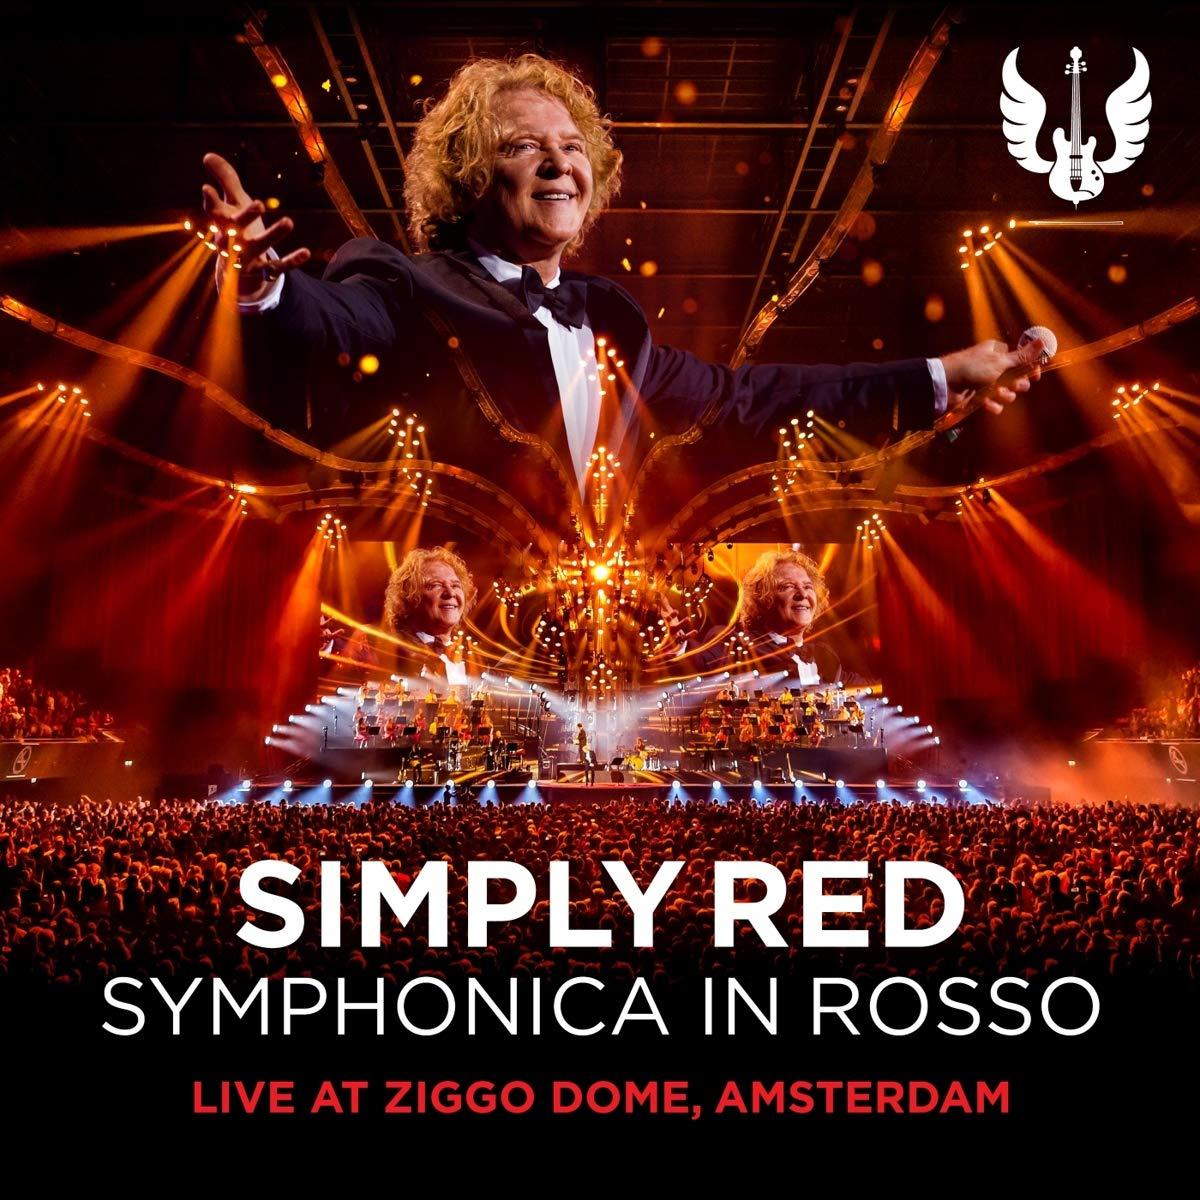 Simply Red - Symphonica In Rosso: Live At Ziggo Dome Amsterdam [import] (Bonus DVD, United Kingdom - Import)